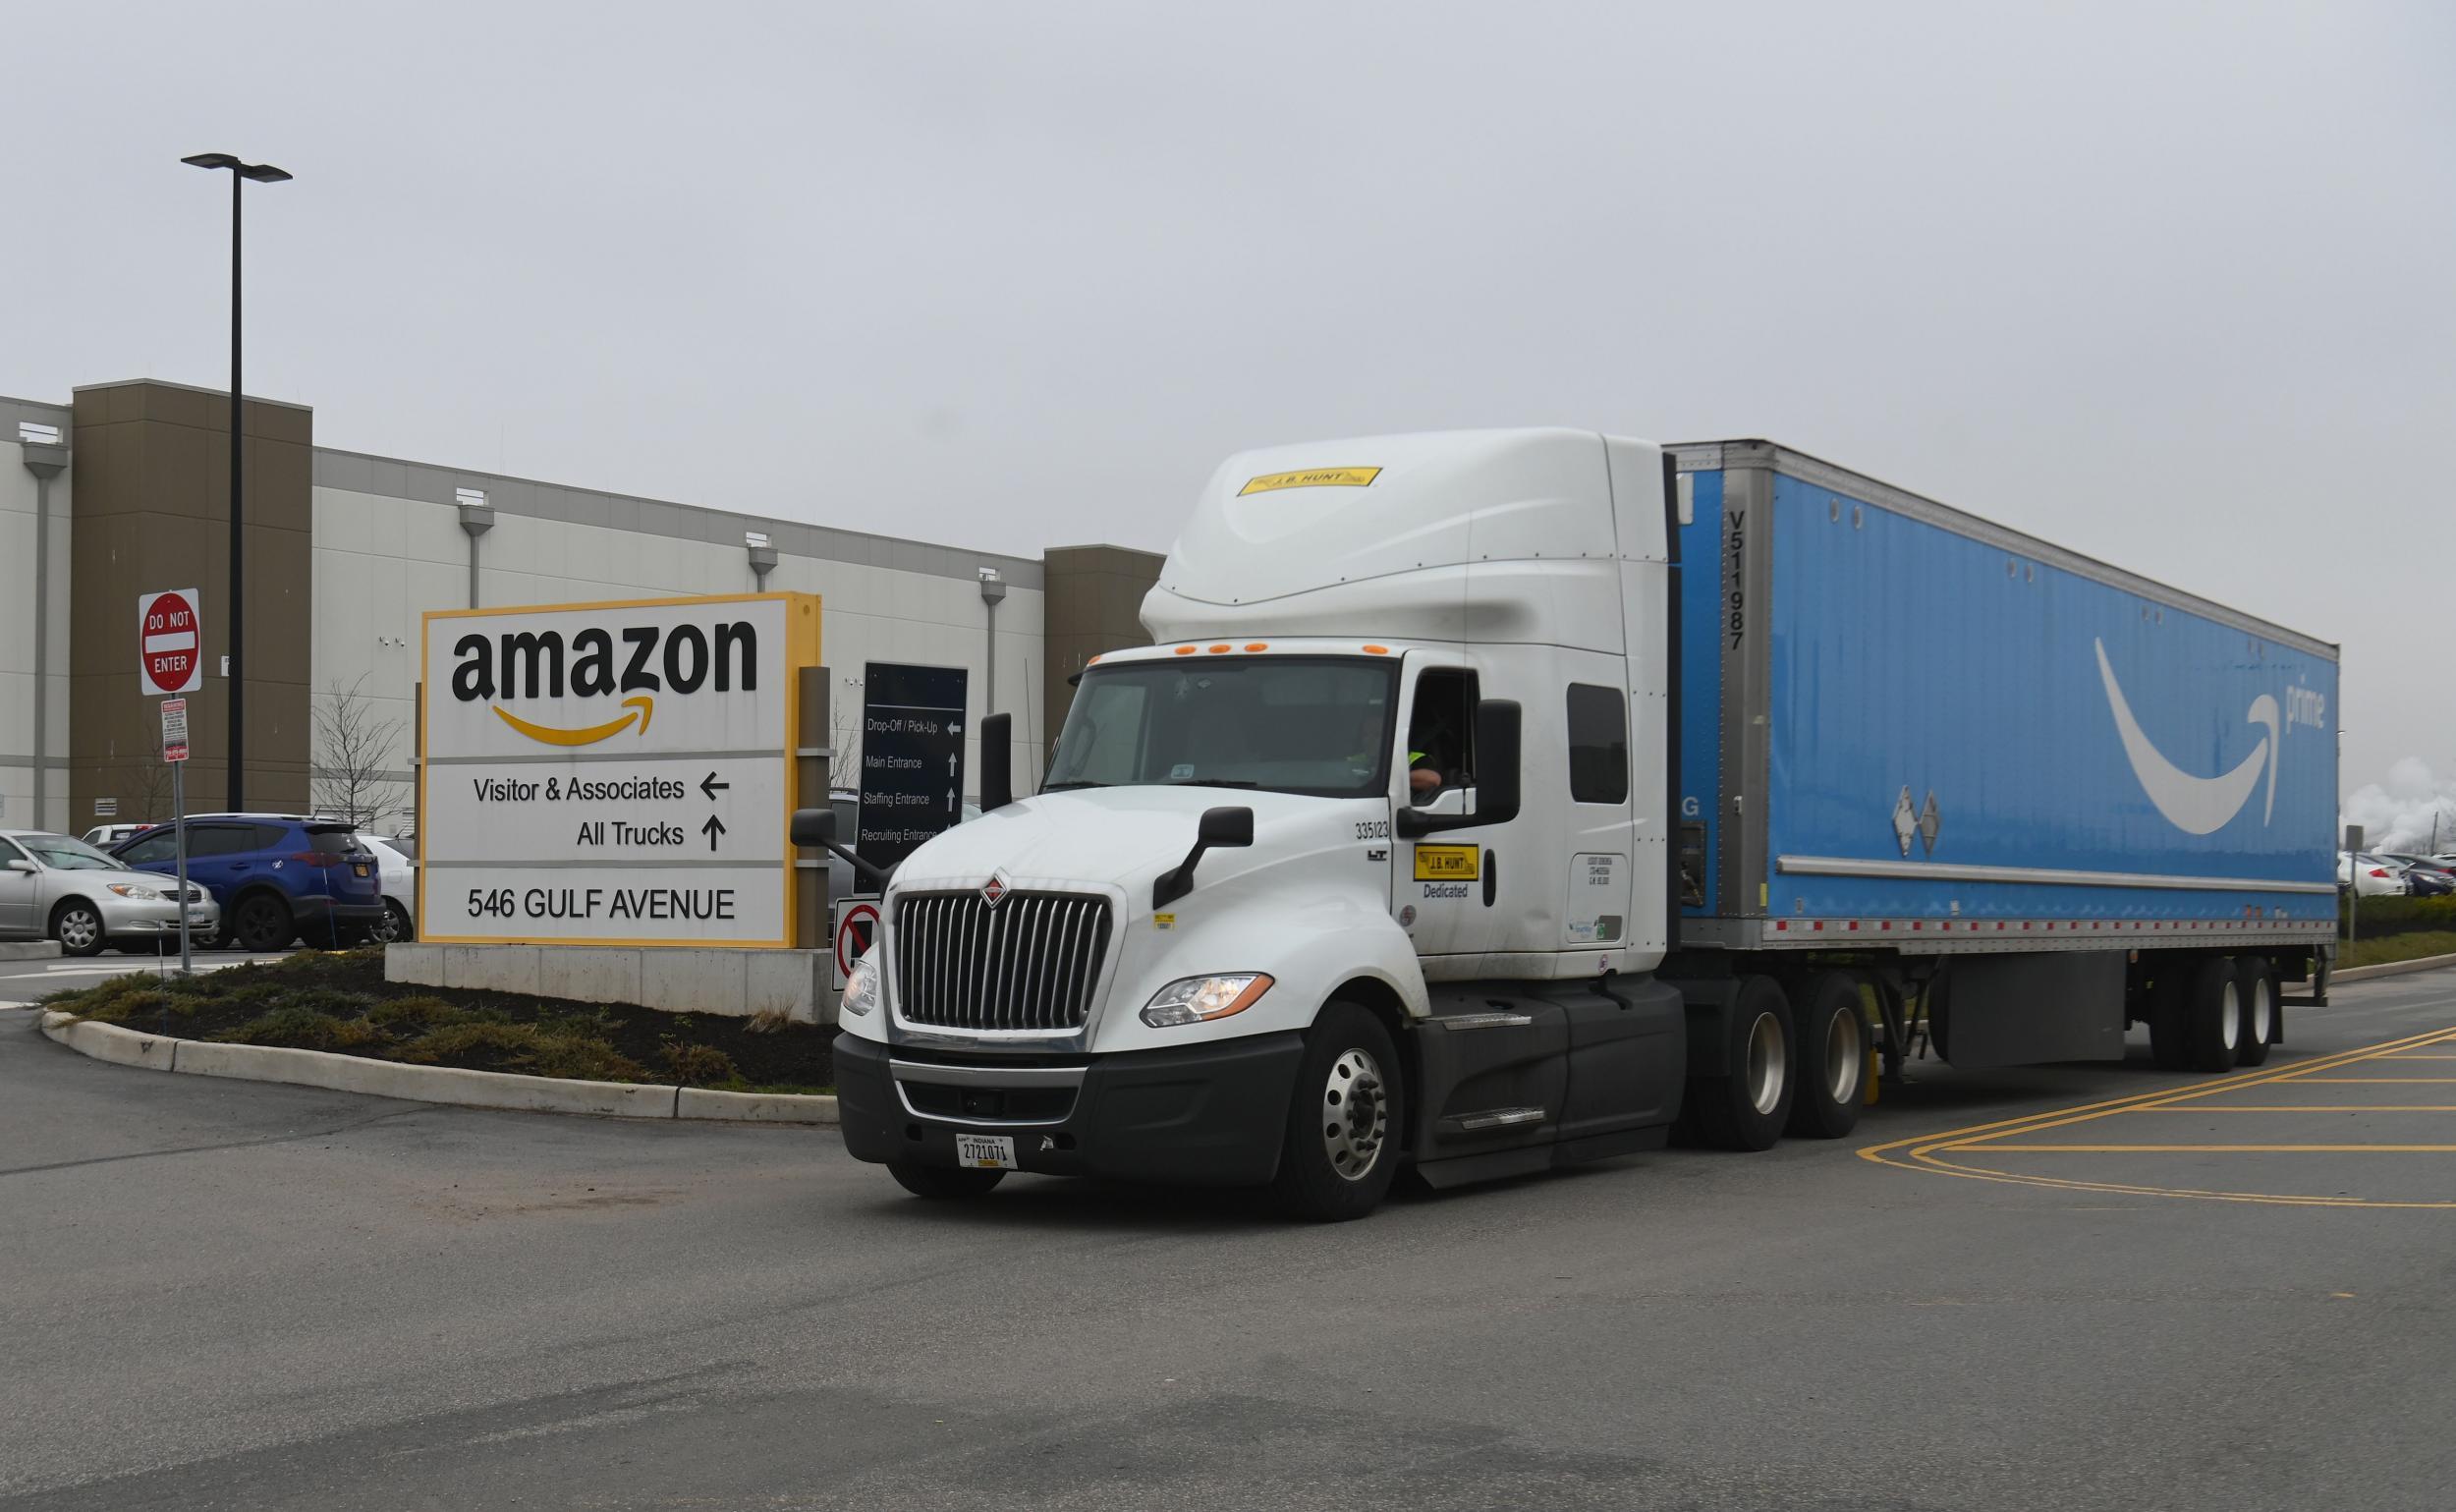 Coronavirus: Amazon to hire 75,000 more people to handle contagion-driven demand